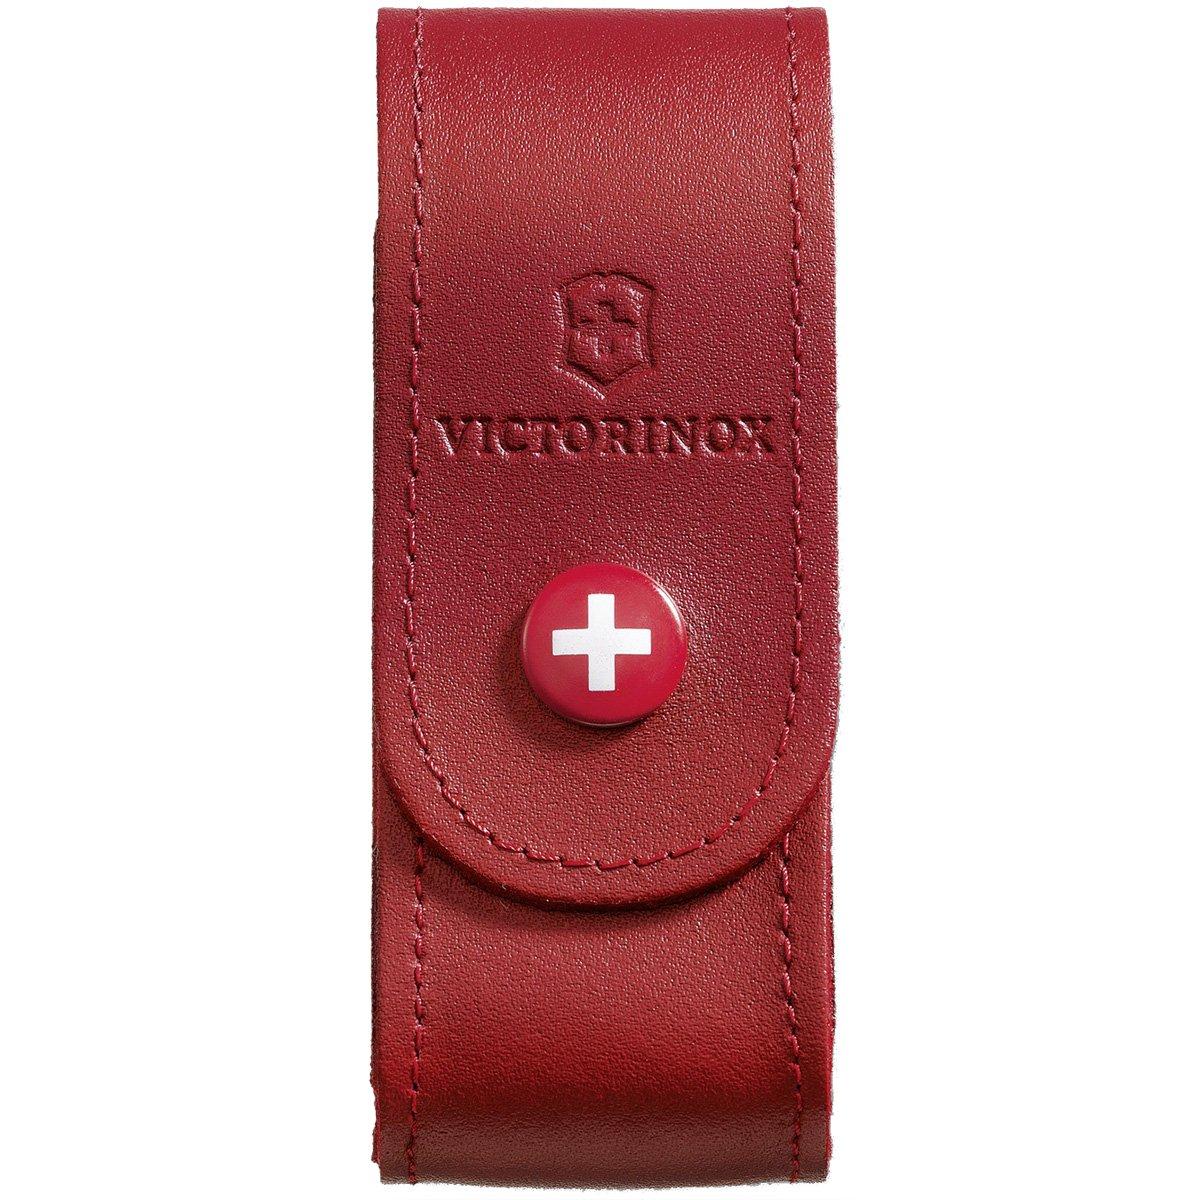 e123b54a832f Victorinox 4.0520.1 Etui Cuir Rouge. par Victorinox. product price€16.01